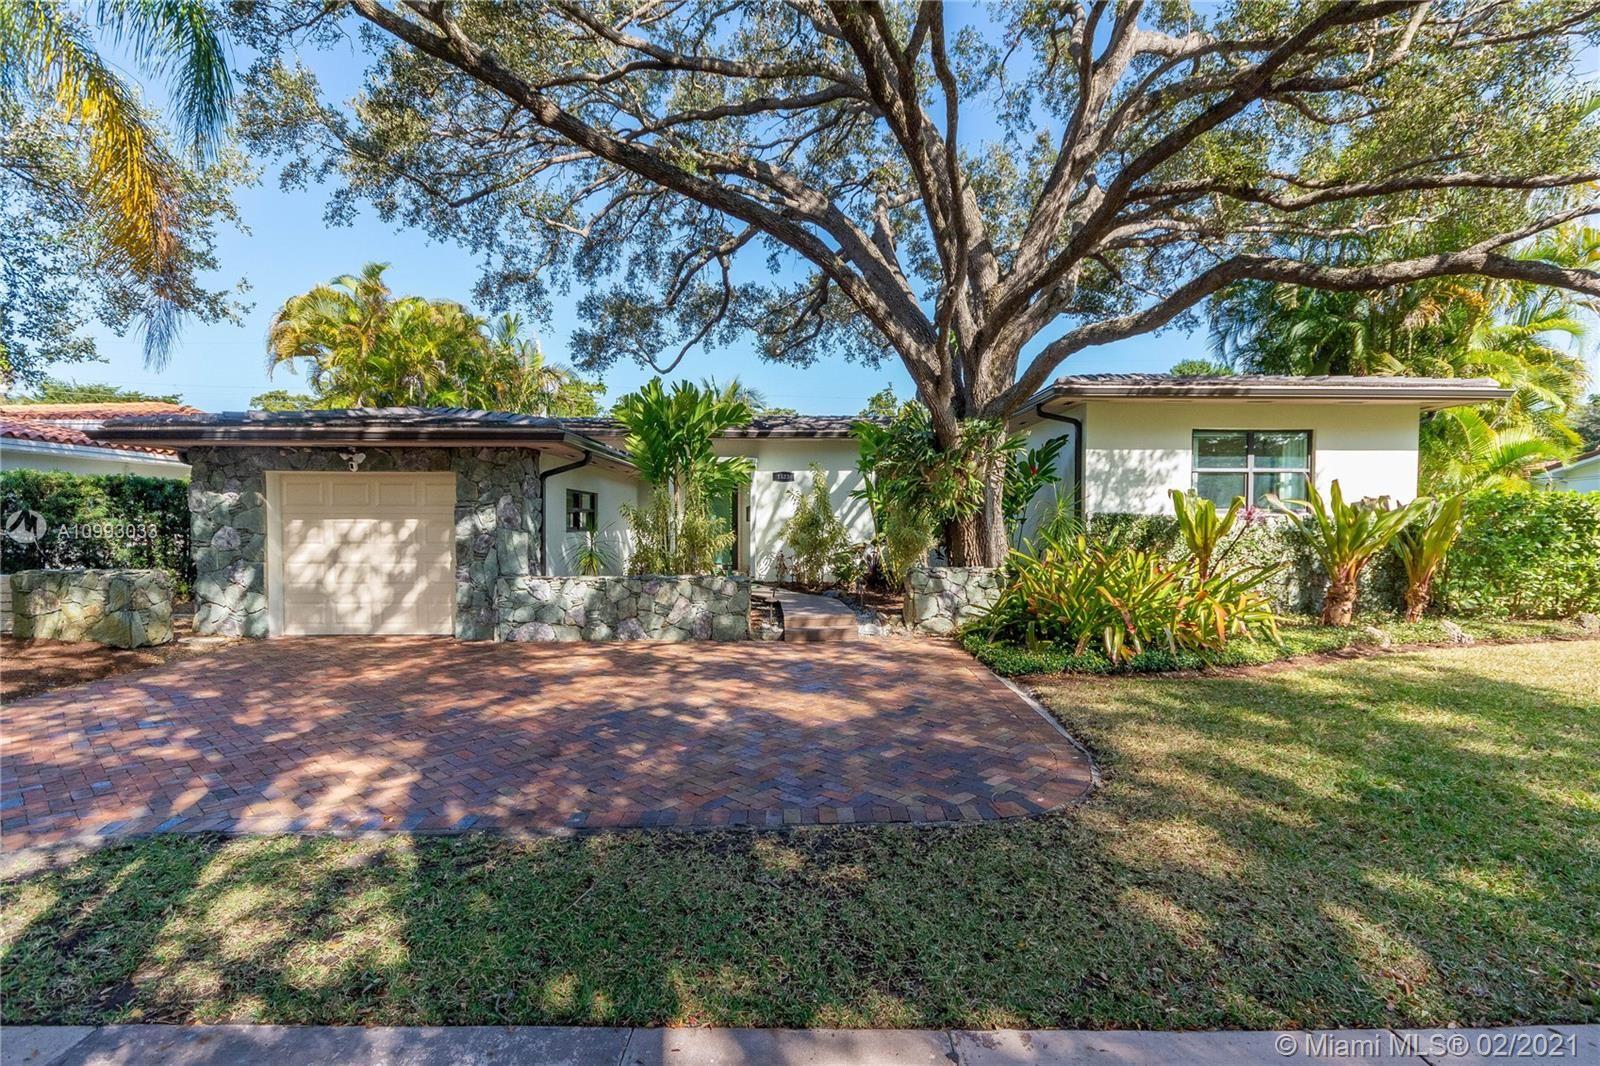 1523 Zoreta Ave, Coral Gables, FL 33146 - #: A10993033